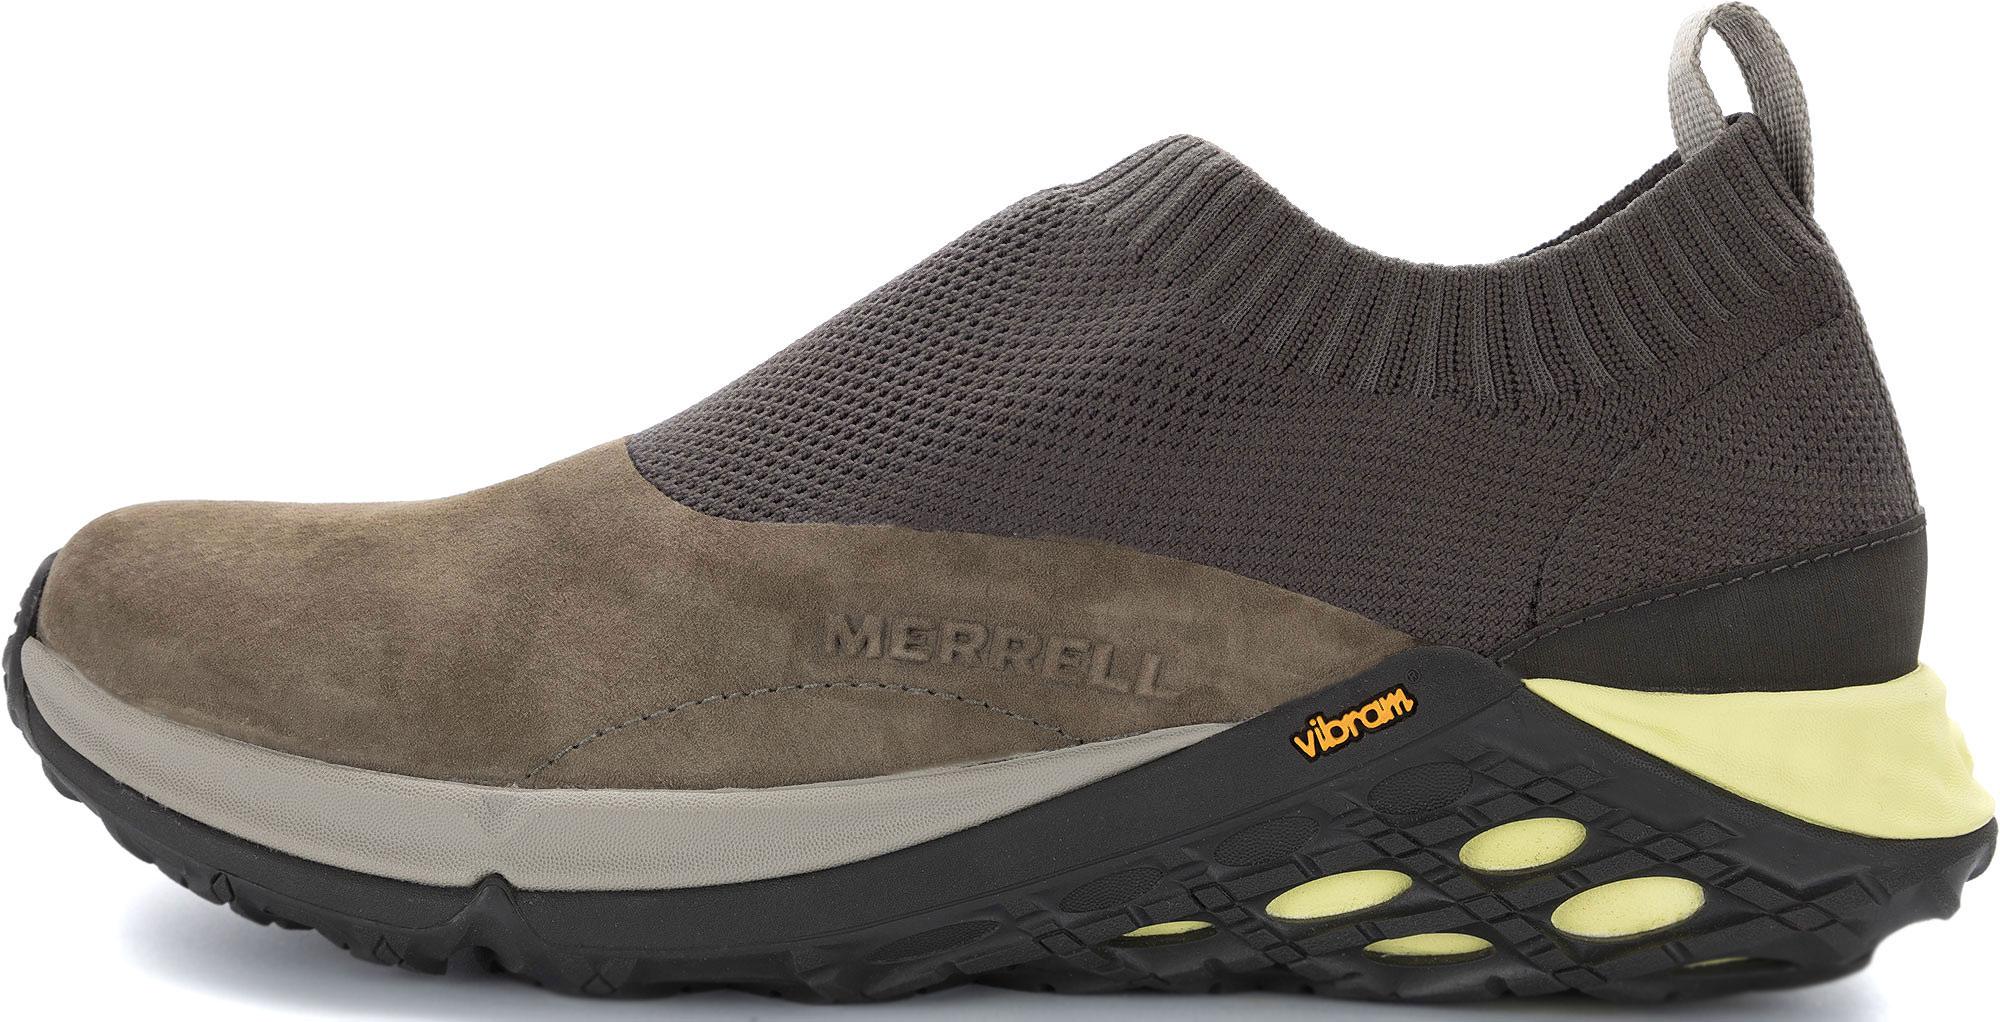 Merrell Полуботинки мужские Merrell Jungle Moc XX Ac+, размер 42